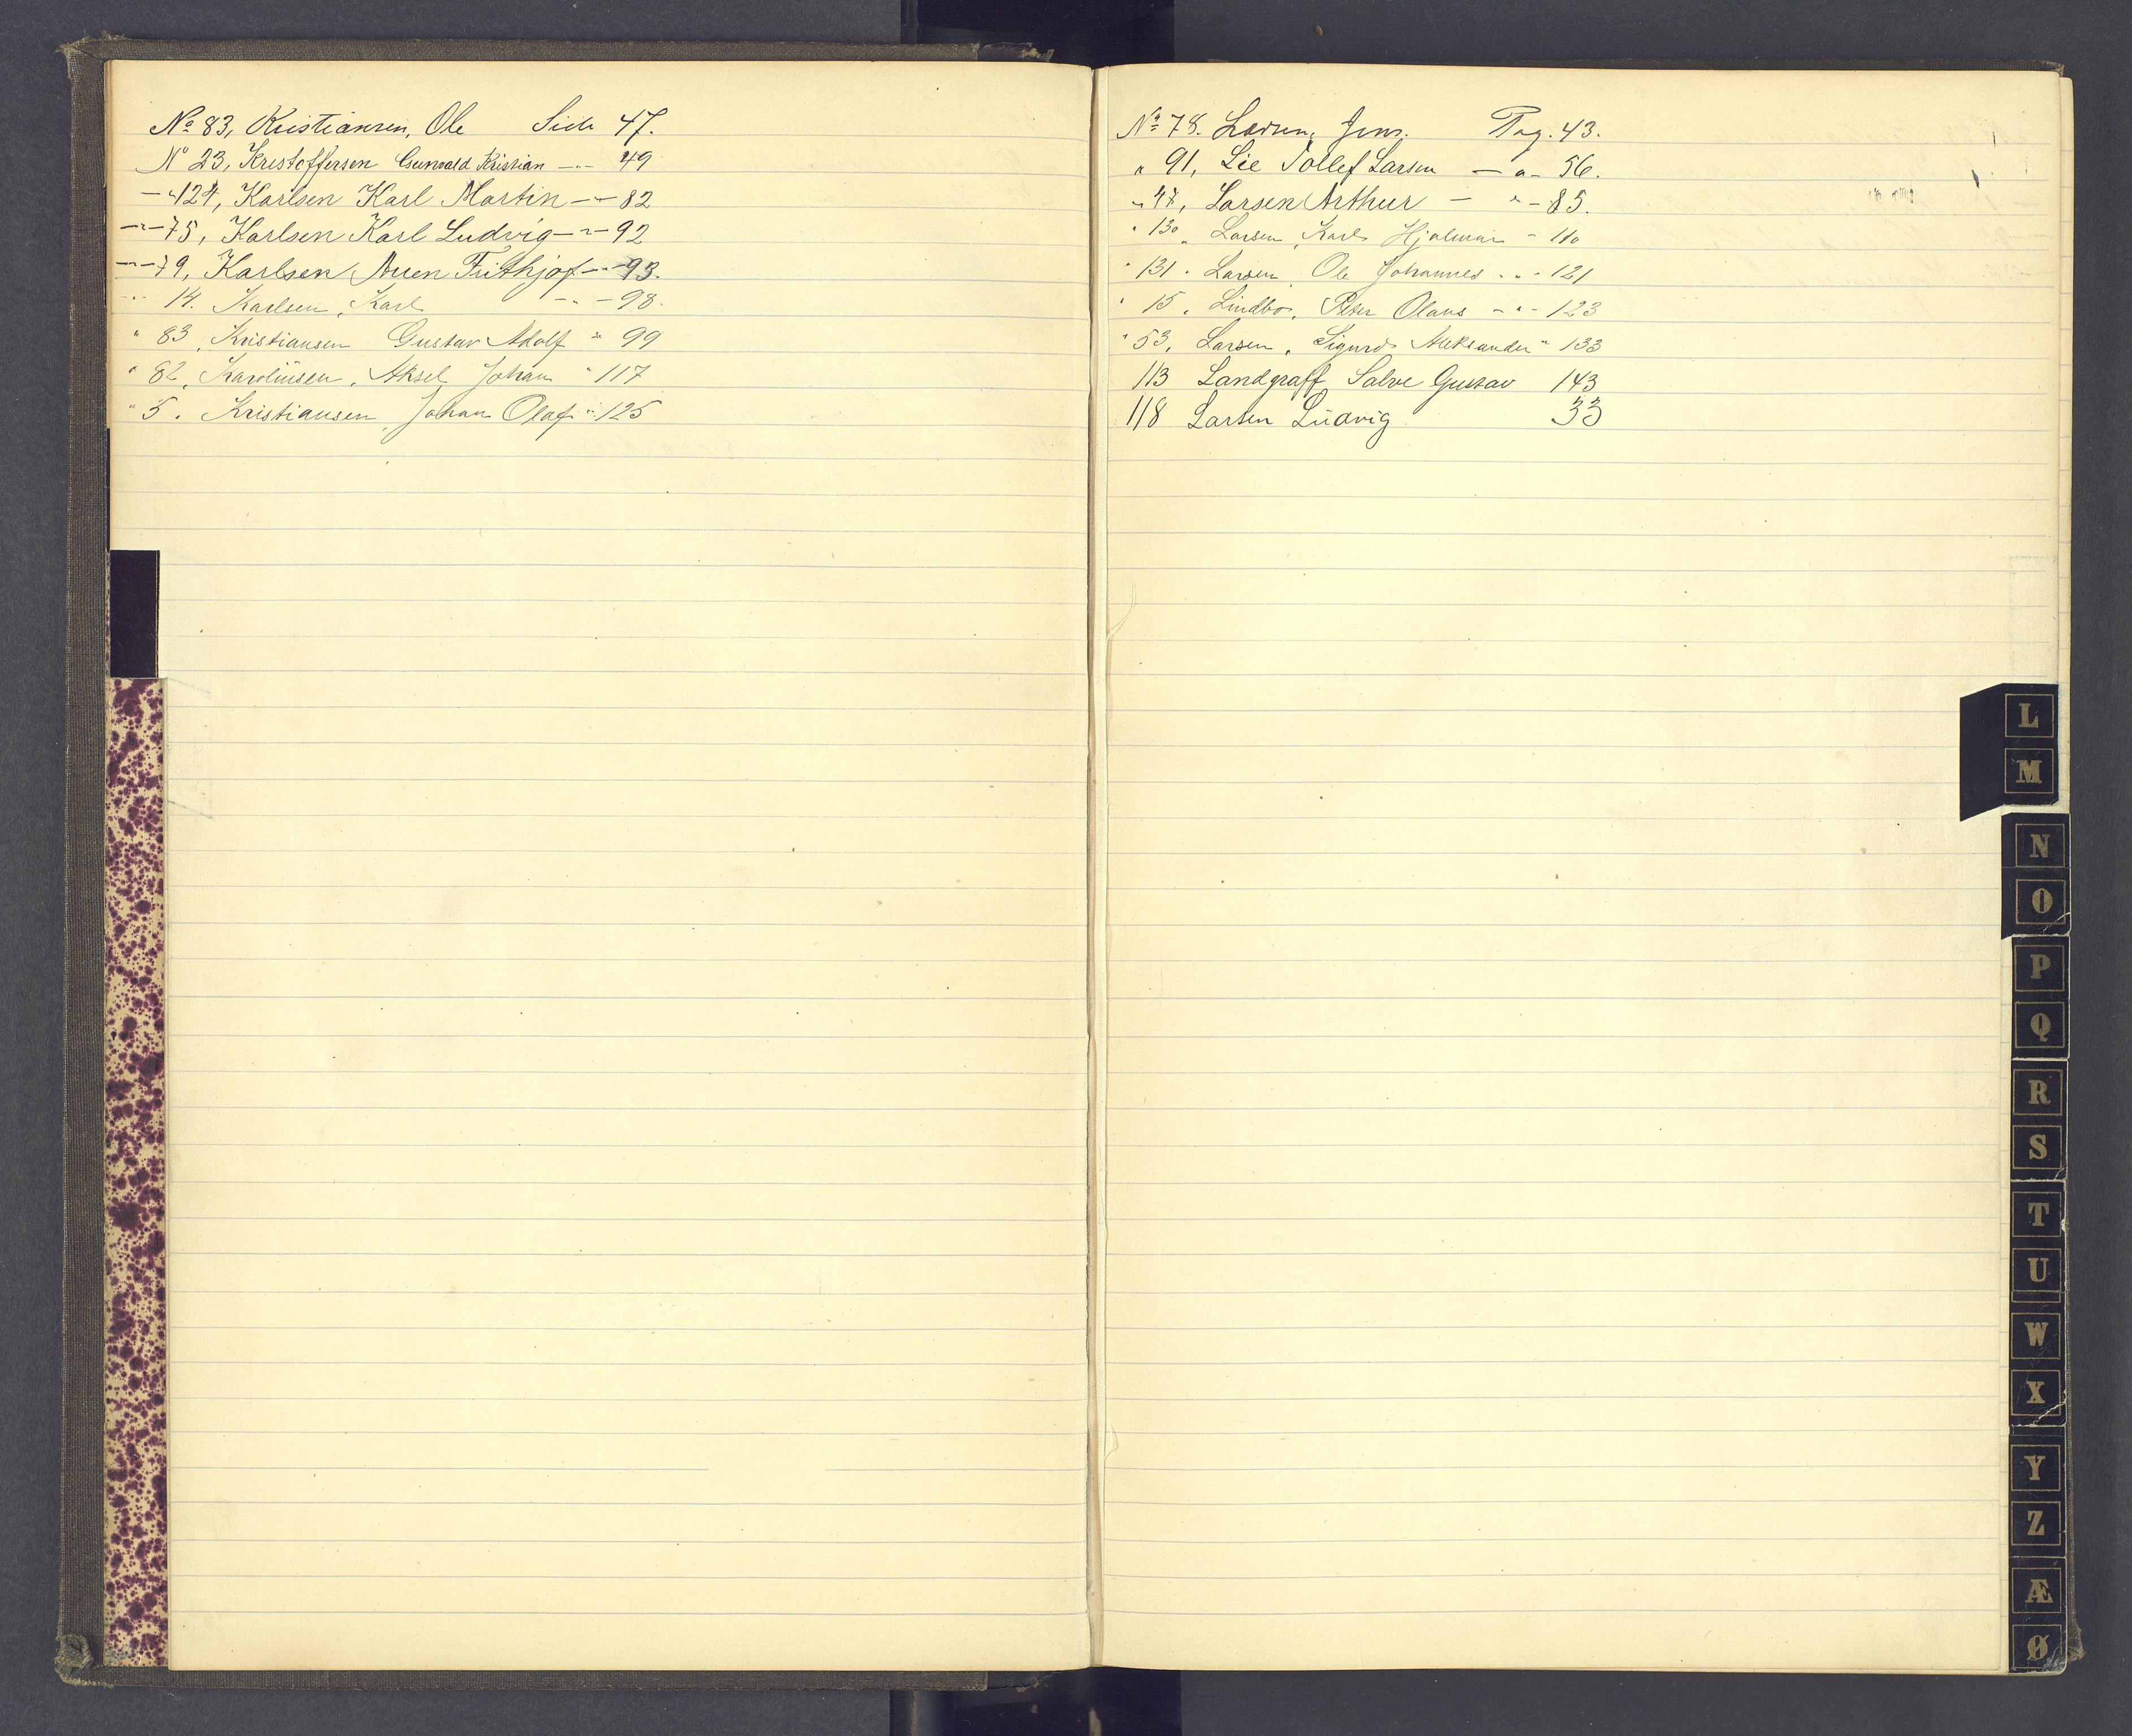 SAH, Toftes Gave, F/Fc/L0003: Elevprotokoll, 1886-1897, s. upaginert